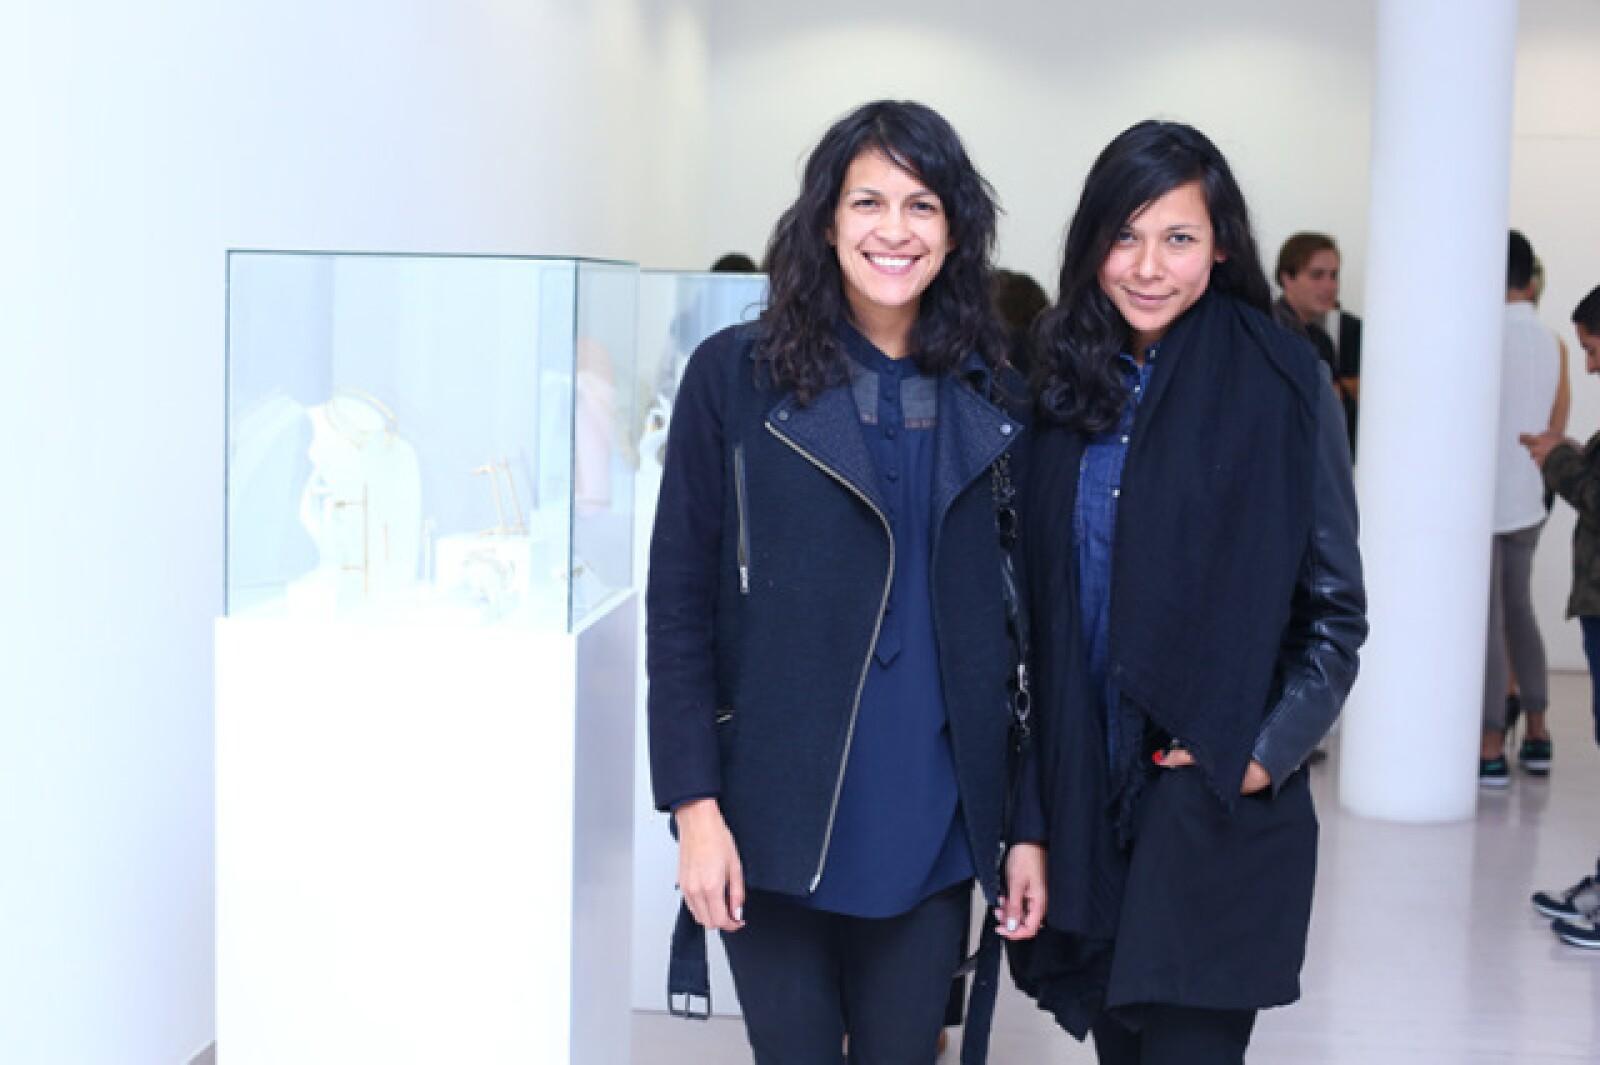 Fabiola Zamora y Danae Salazar